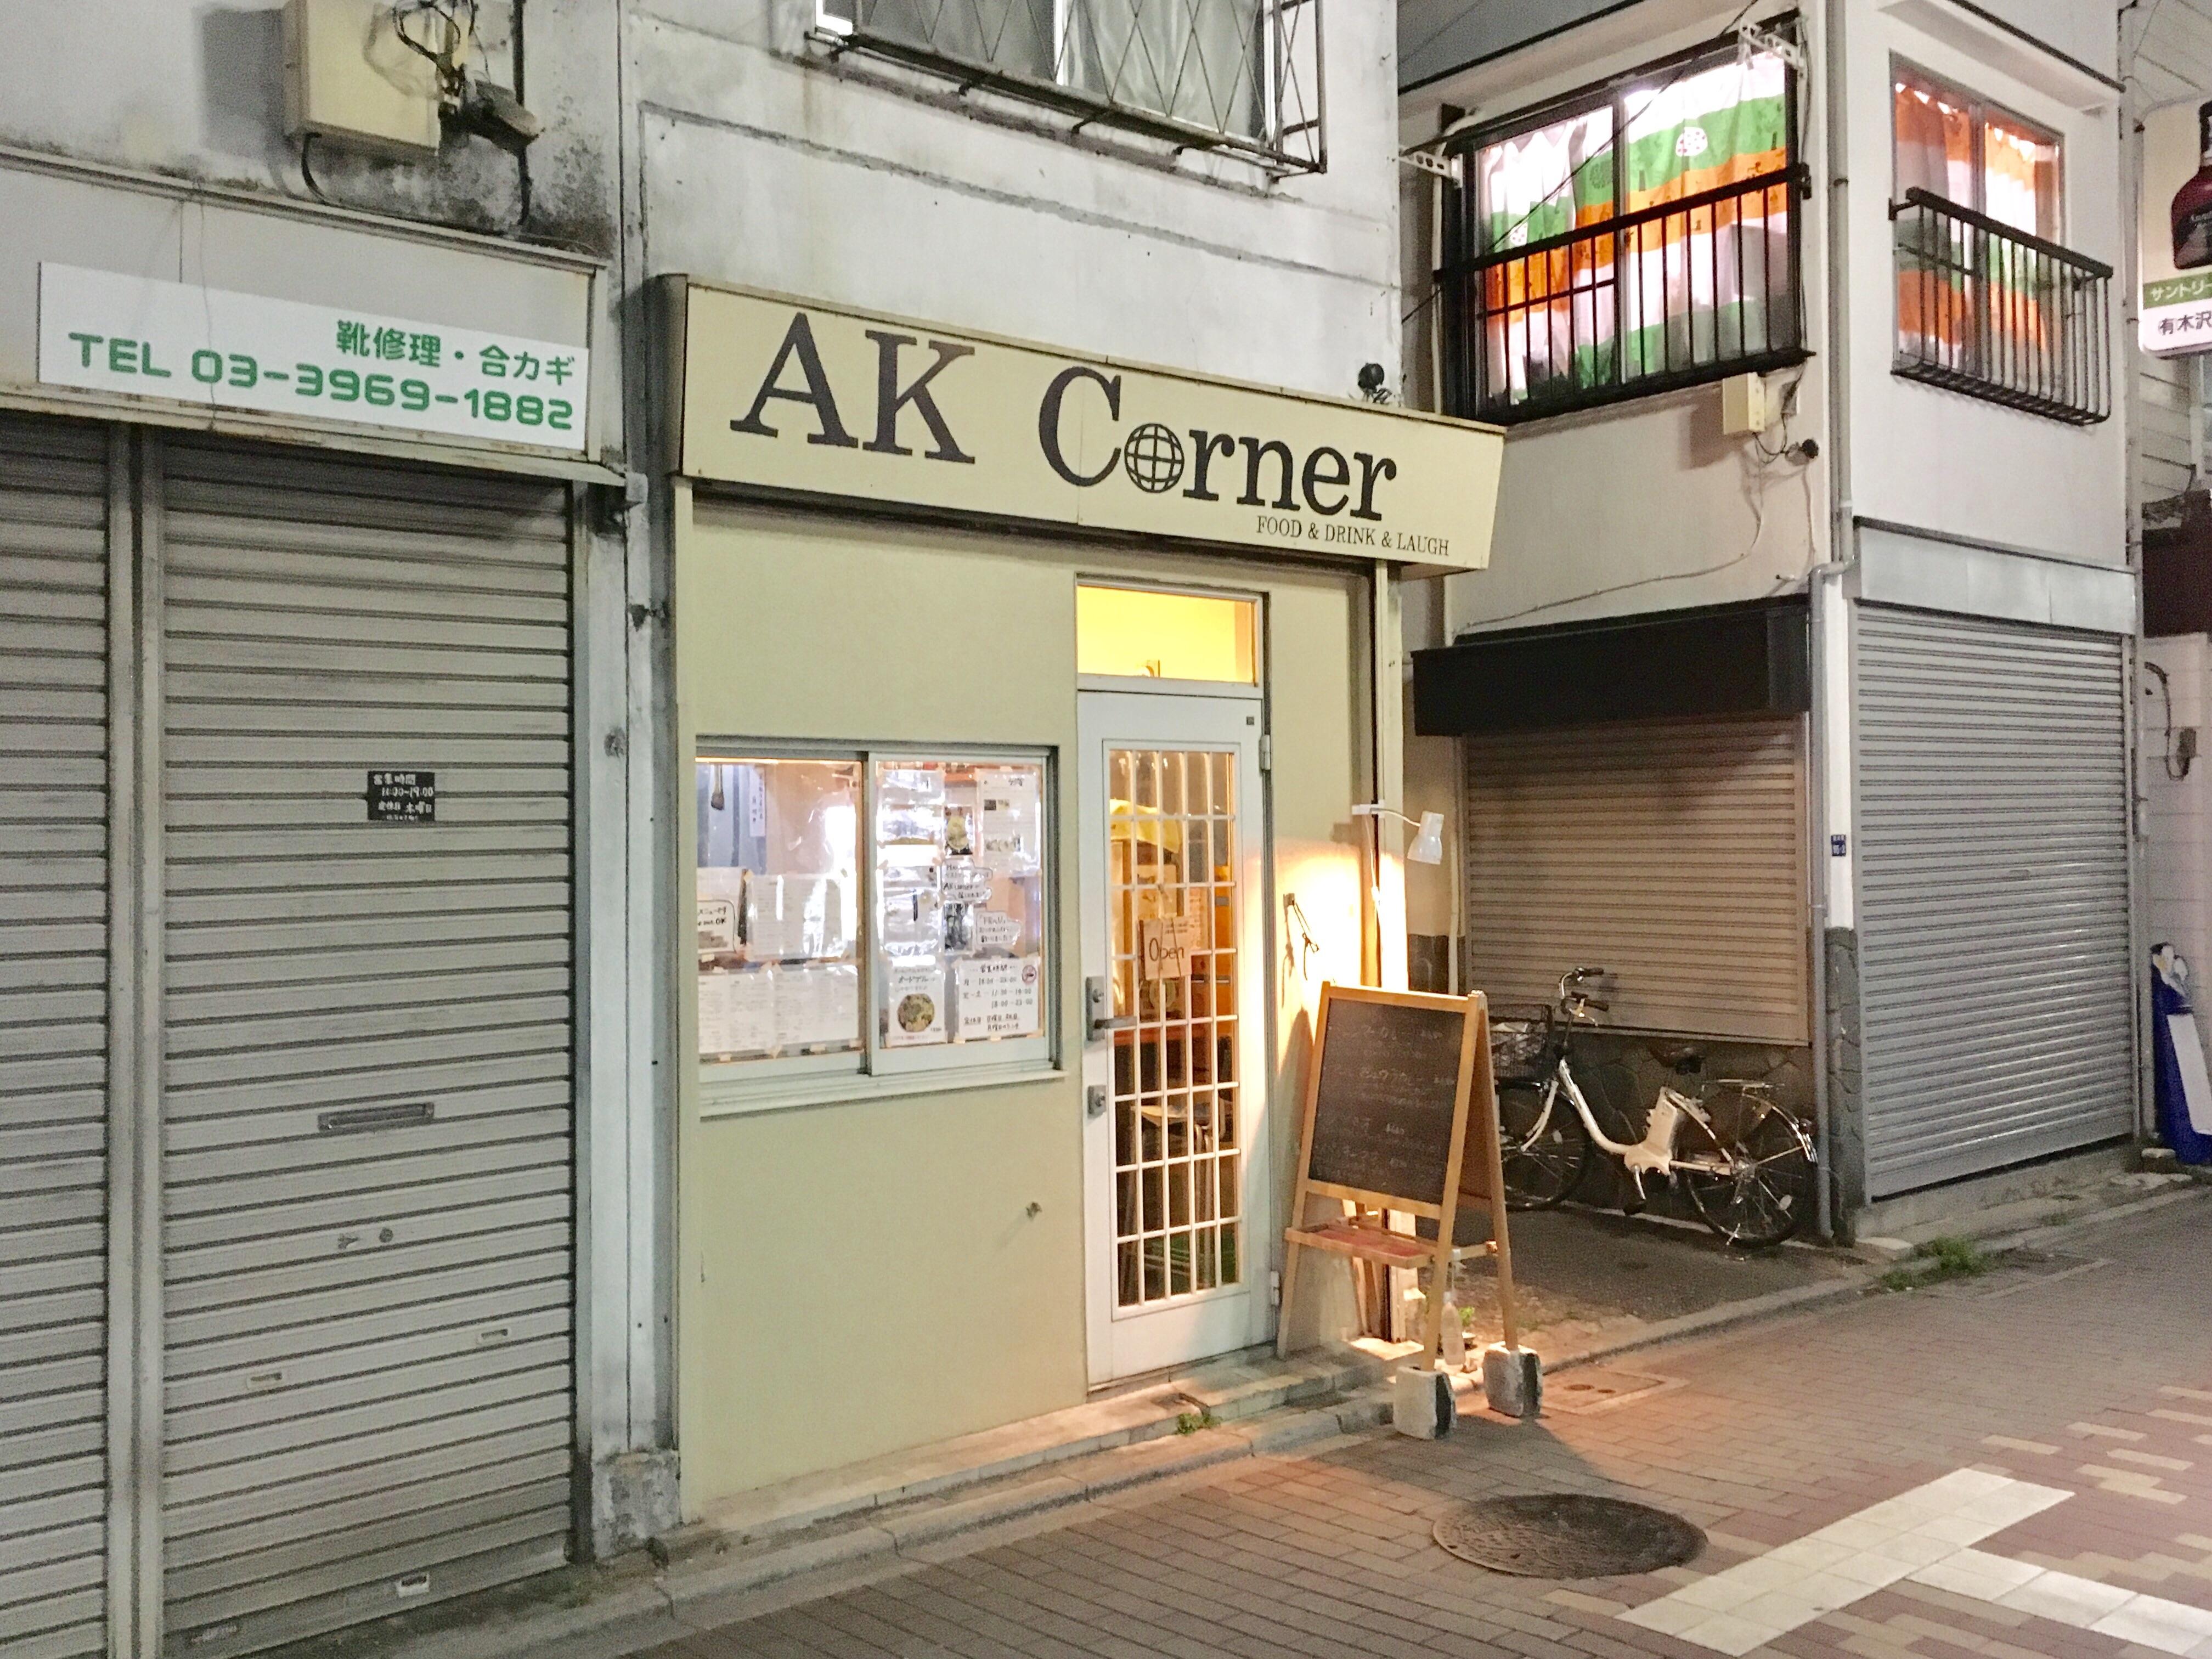 f:id:SoichiroIkeshita:20170428145801j:image